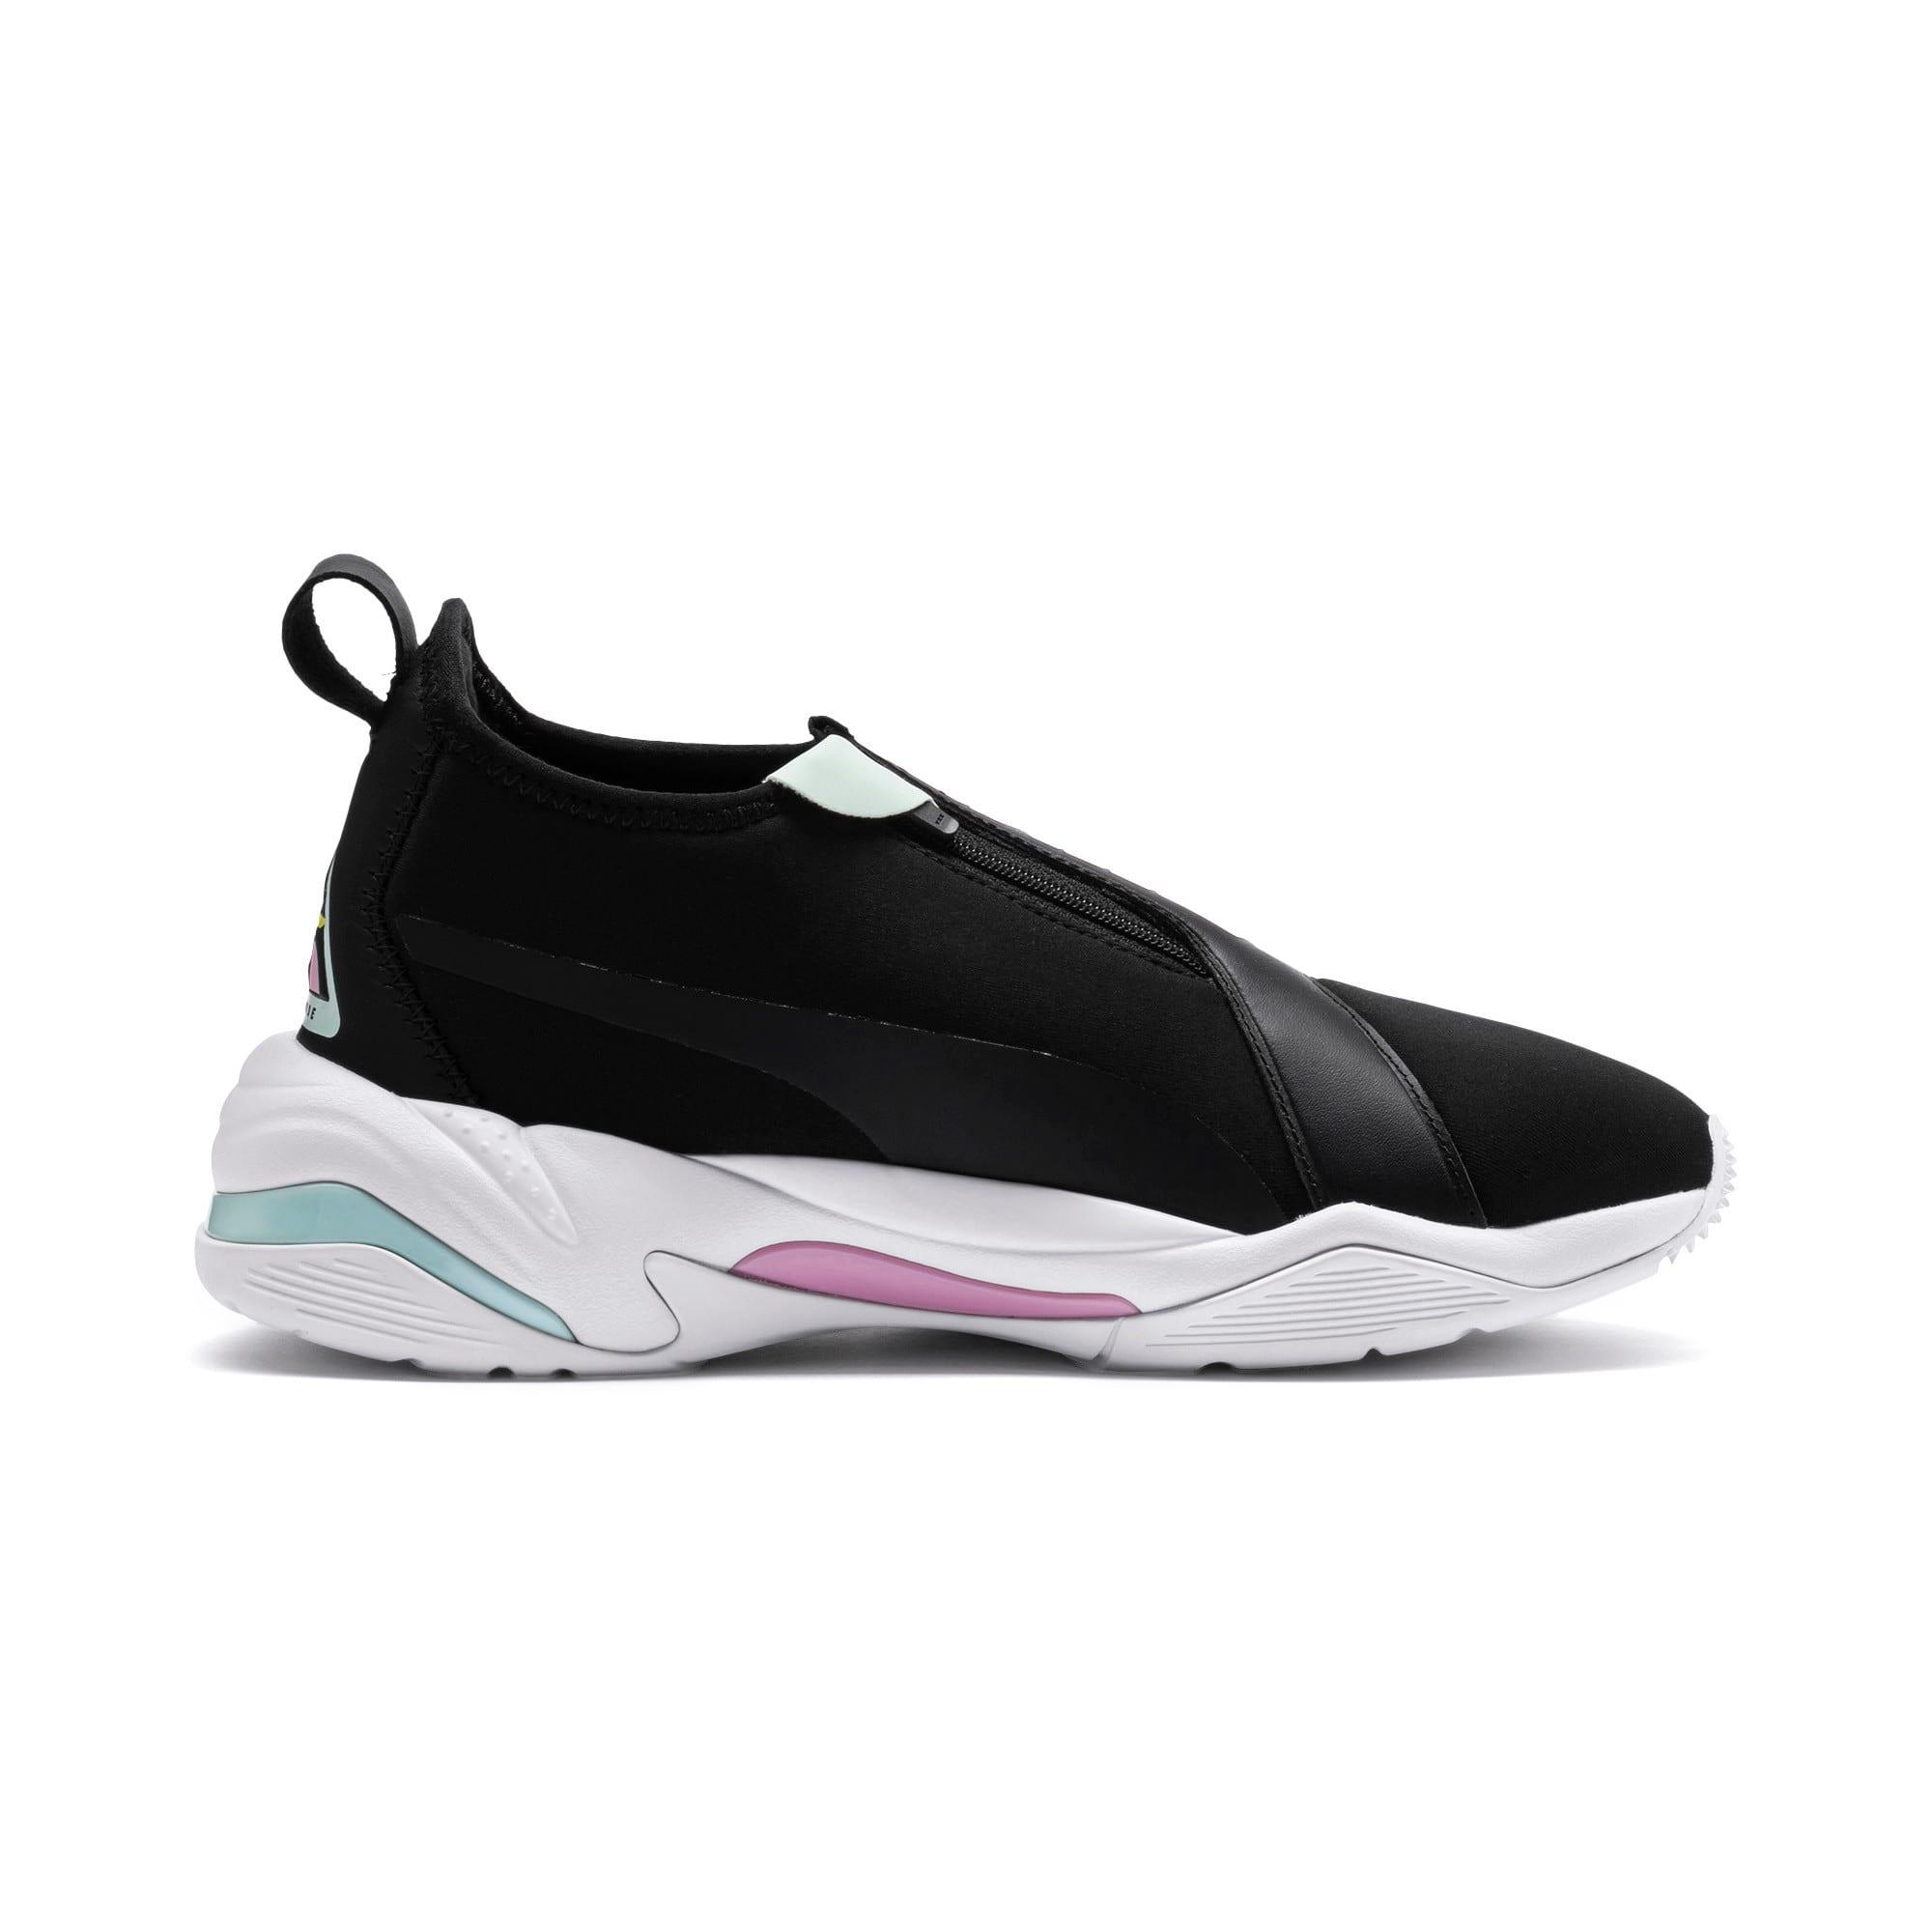 Miniatura 6 de Zapatos deportivos para mujer Thunder Trailblazer, Puma Black-Pale Pink, mediano